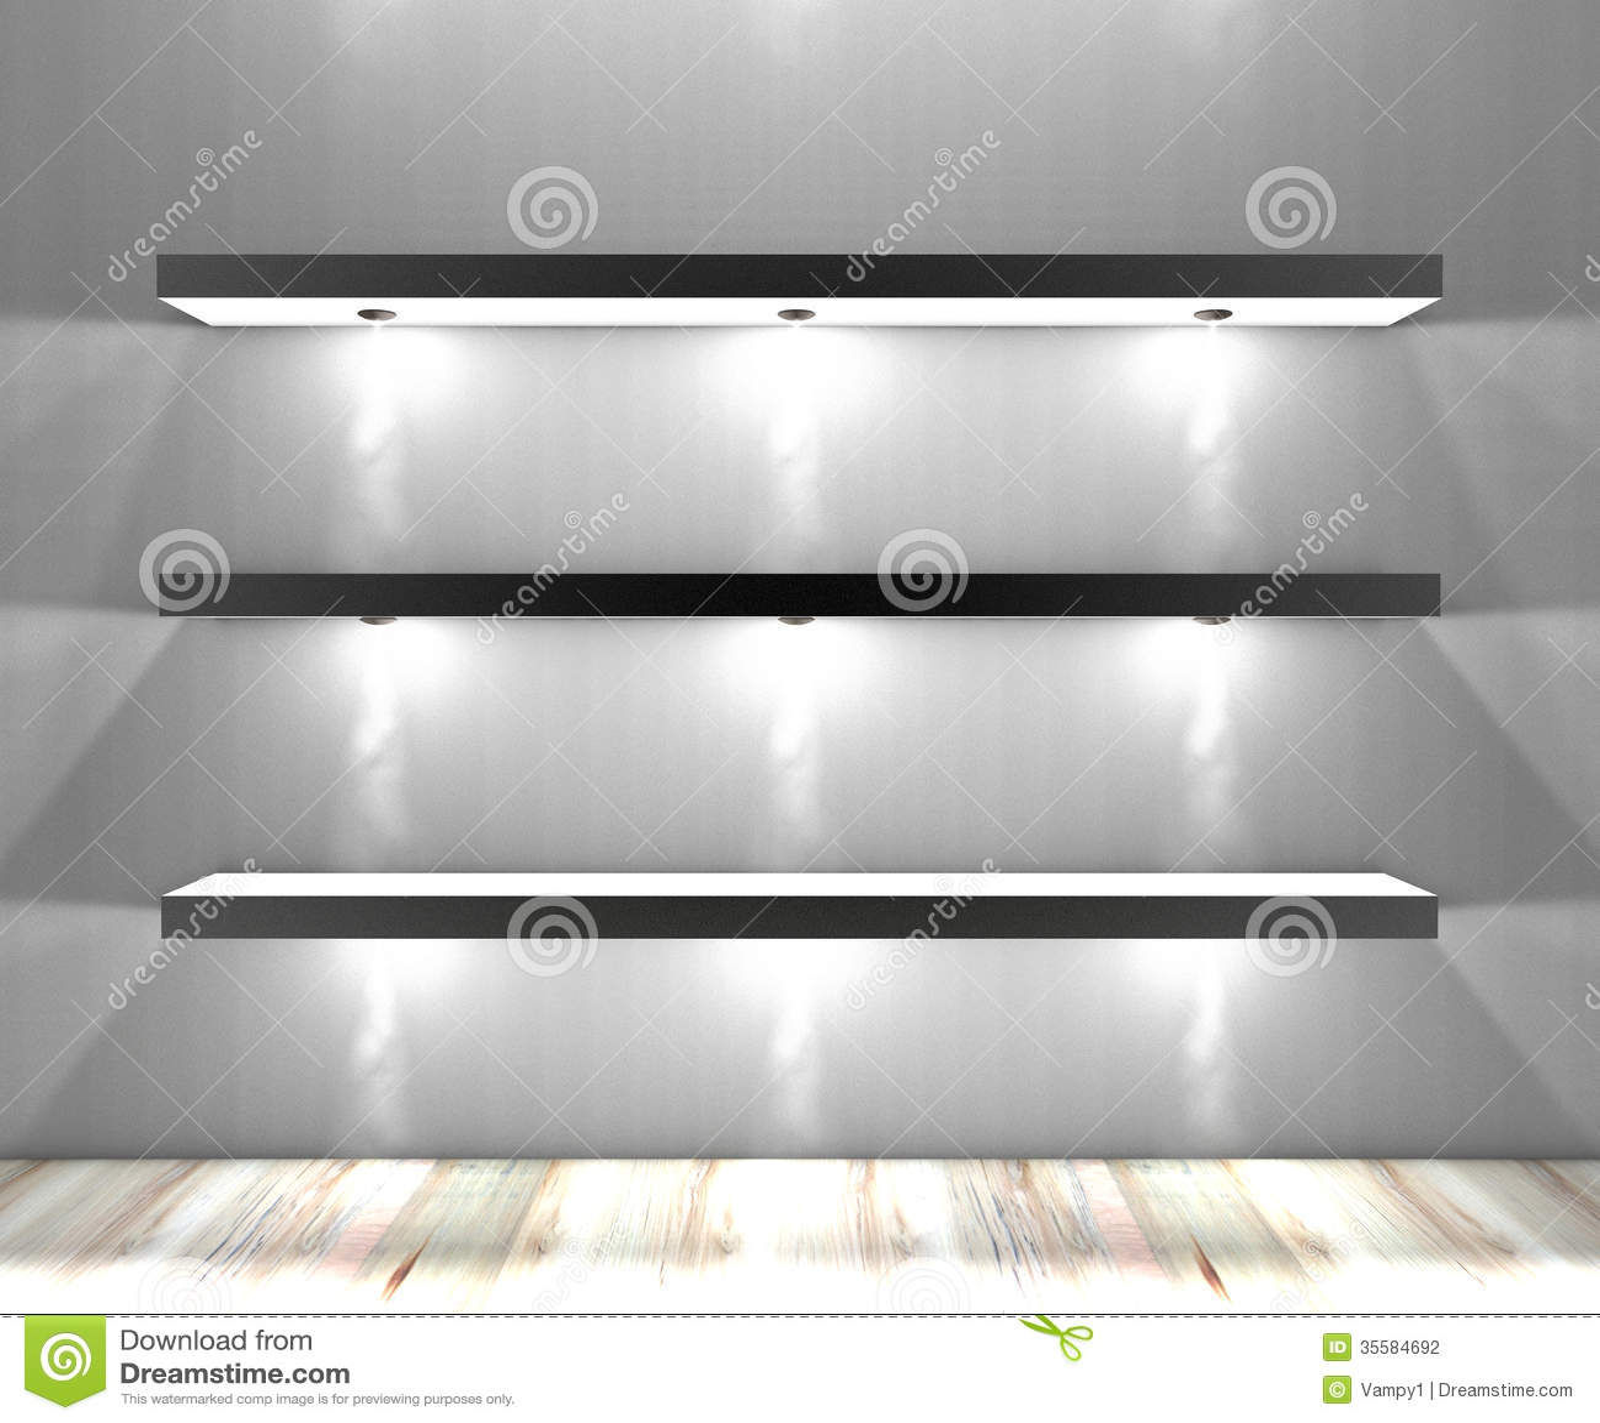 White Shelves With Lights Illuminated Spotlights Stock ...